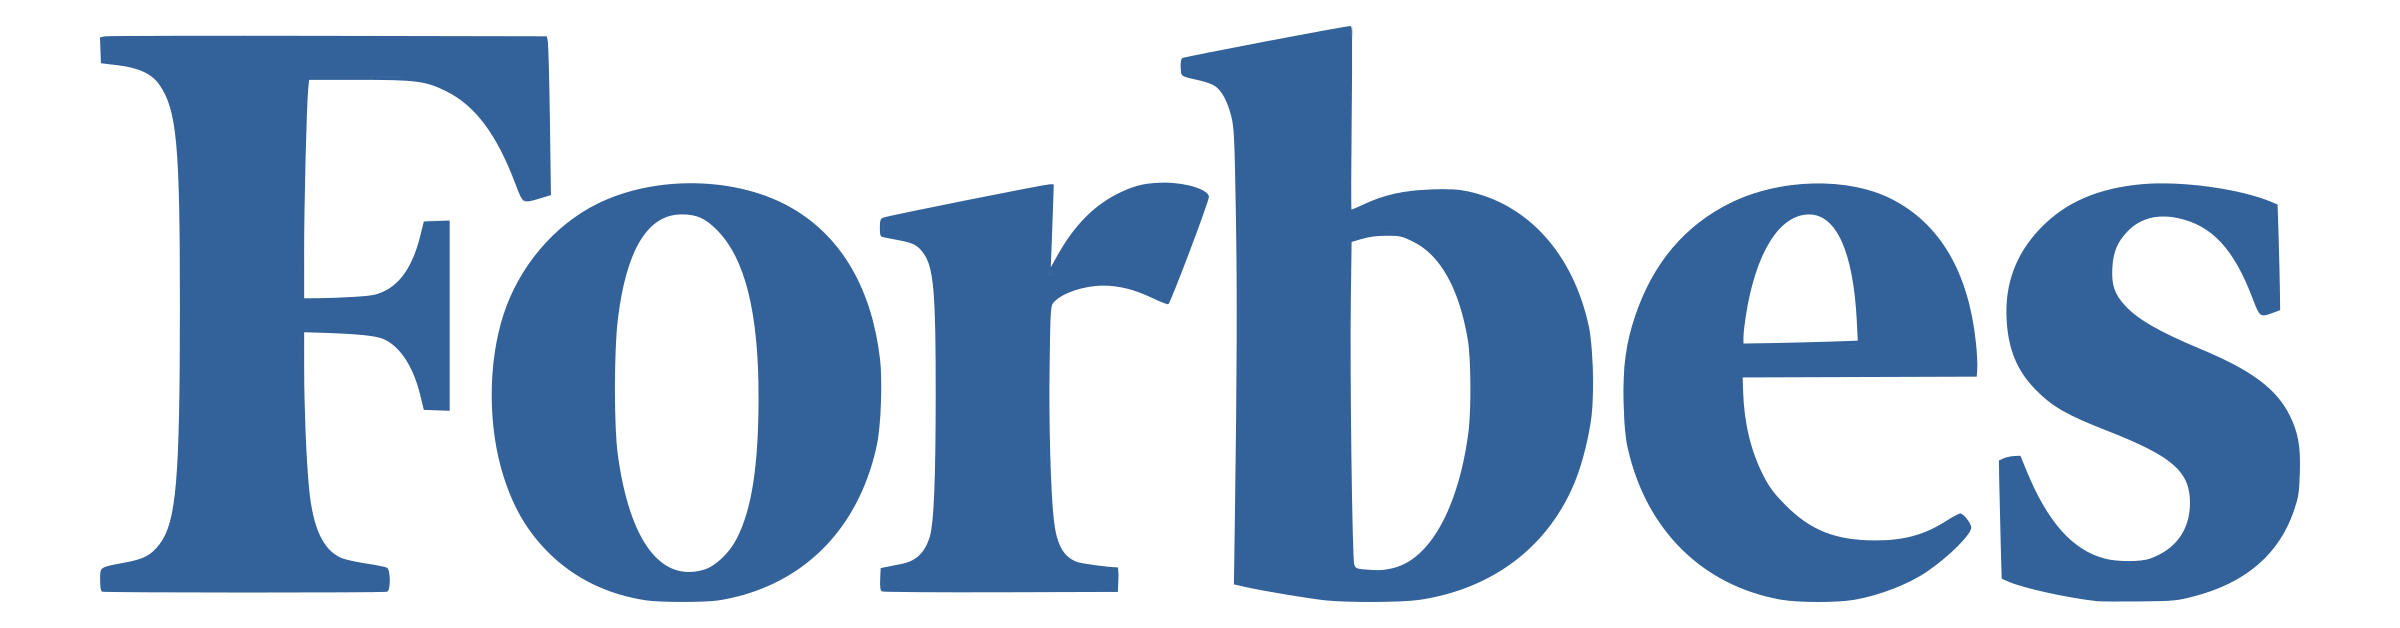 Forbes Logo Png Transparent Svg Vector Freebie Supply